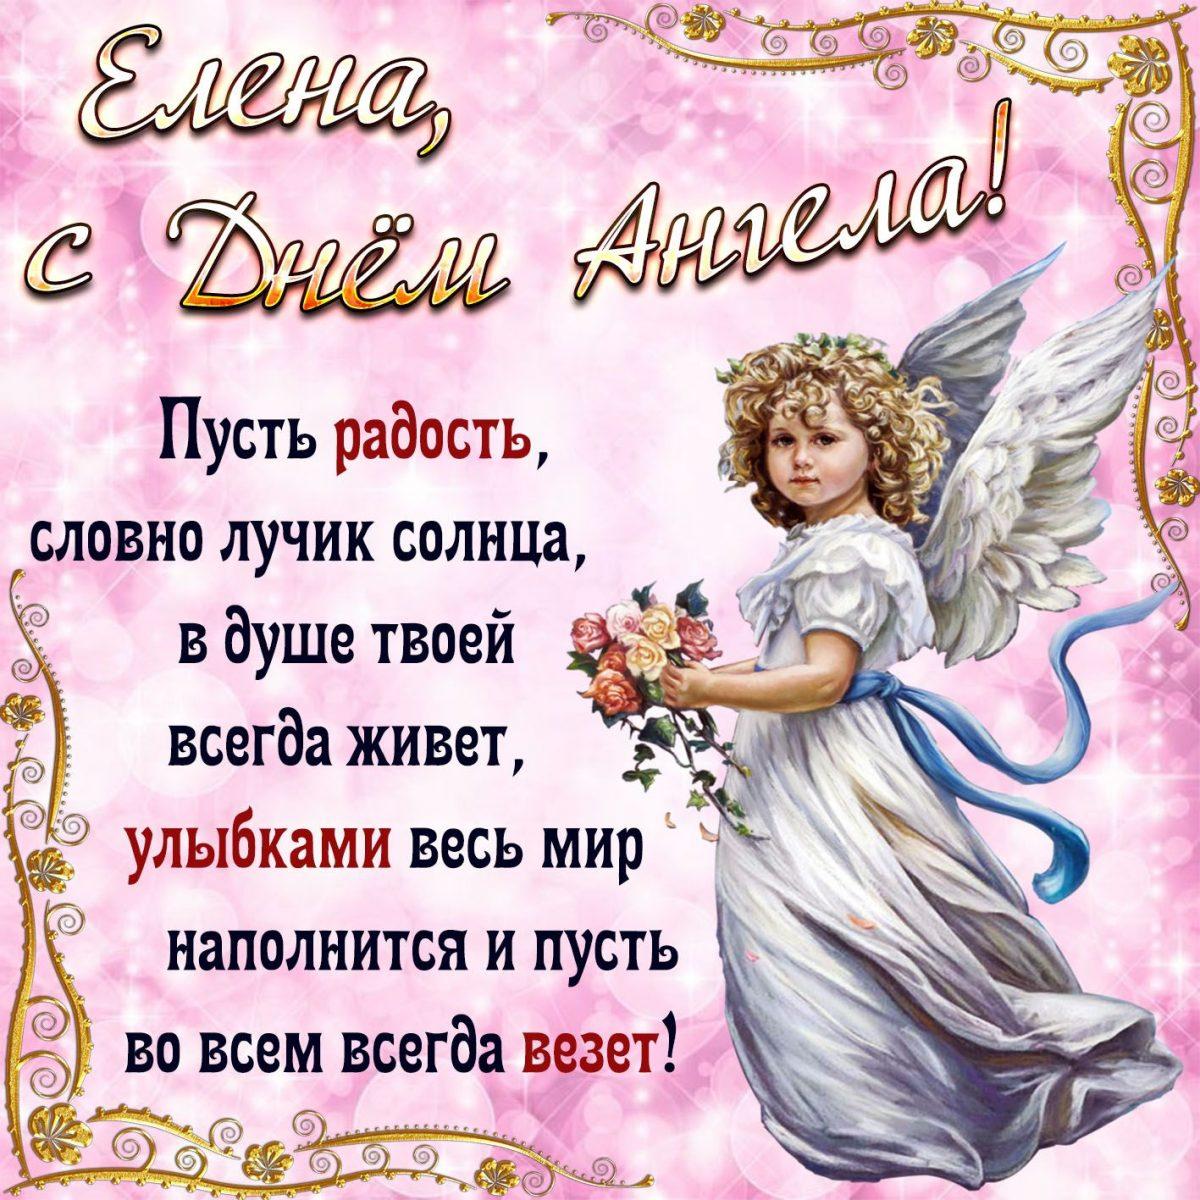 Картинки на именины Елены — с днем ангела (28 фото) ⭐ Картинки с юмором |  Movie posters, Photo, Photo wall